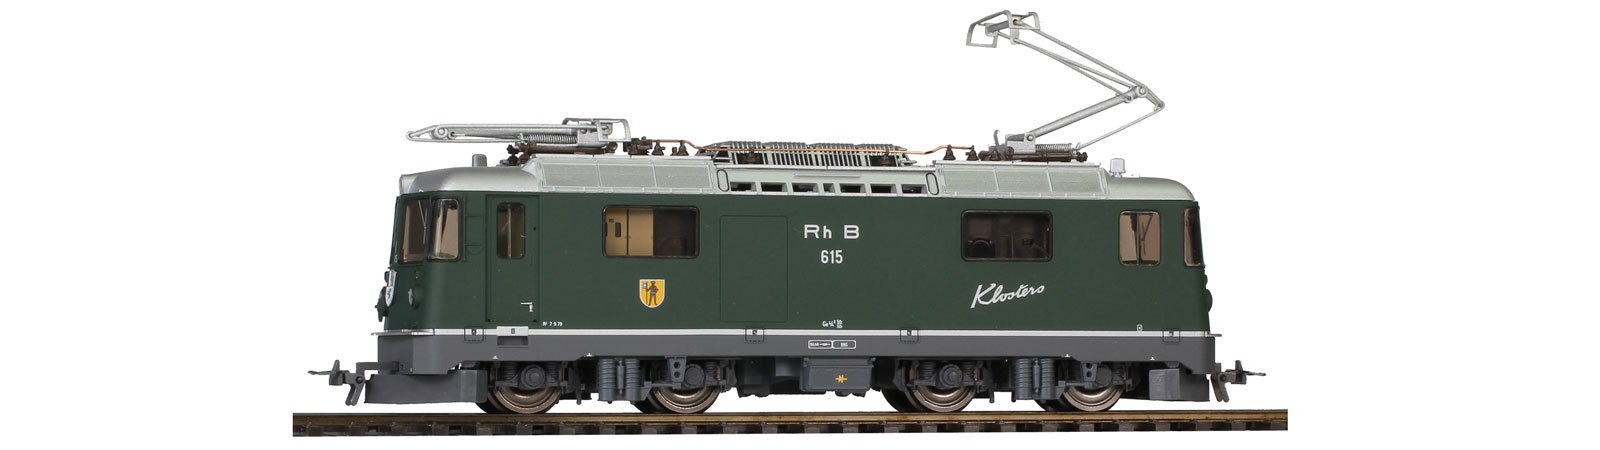 "#1258 115 RhB Ge 4/4 Ⅱ 615 ""Klosters""green ¥44,990(税込)"